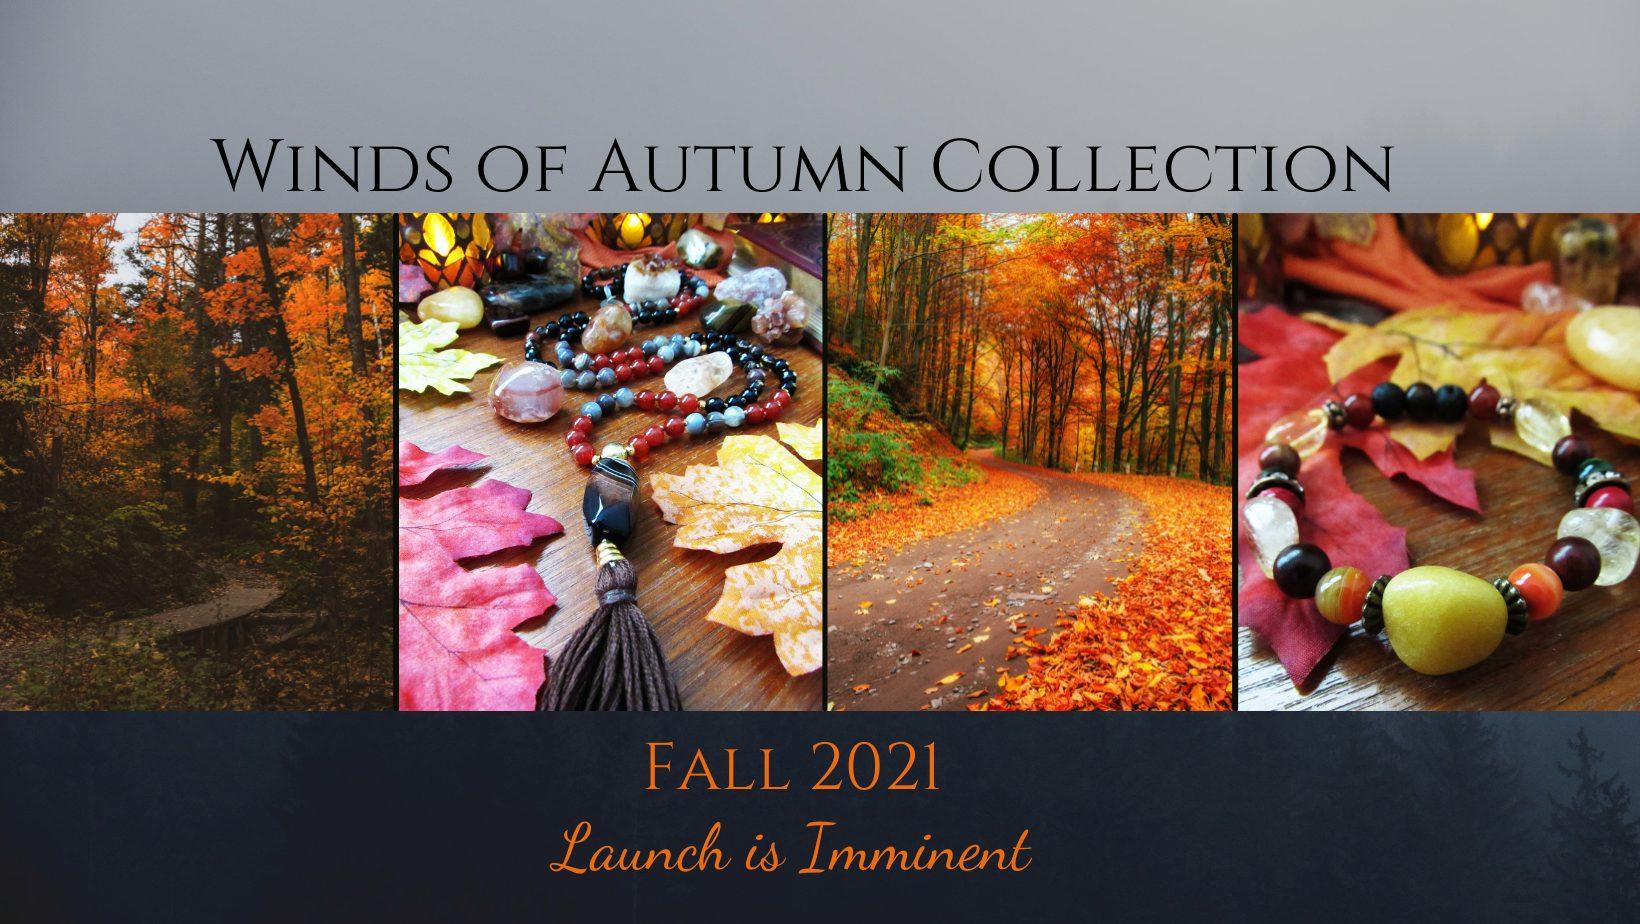 winds-of-autumn